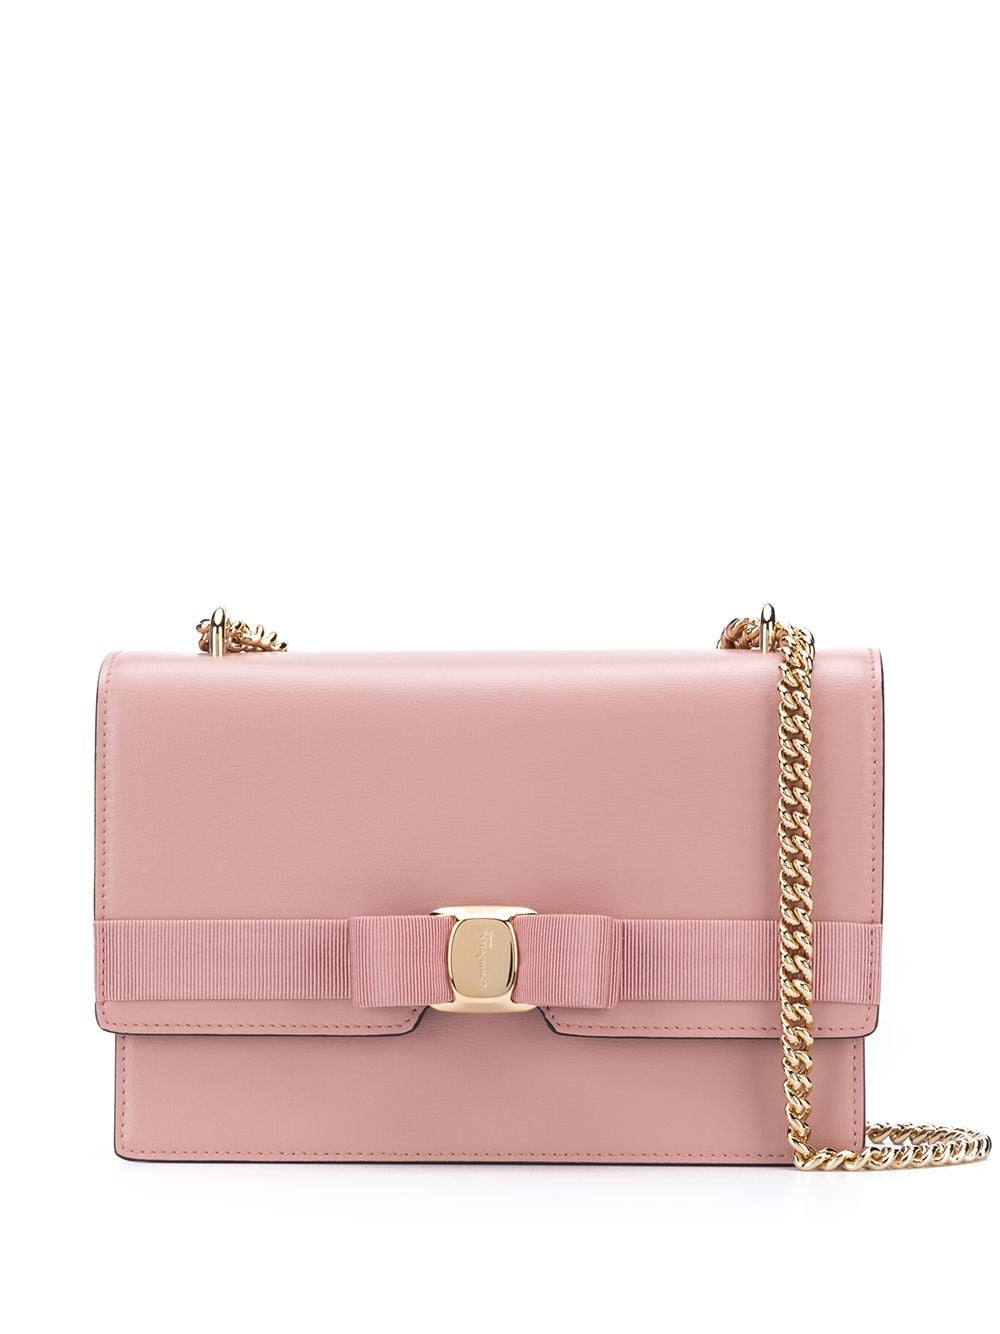 Vara Leather Handbag